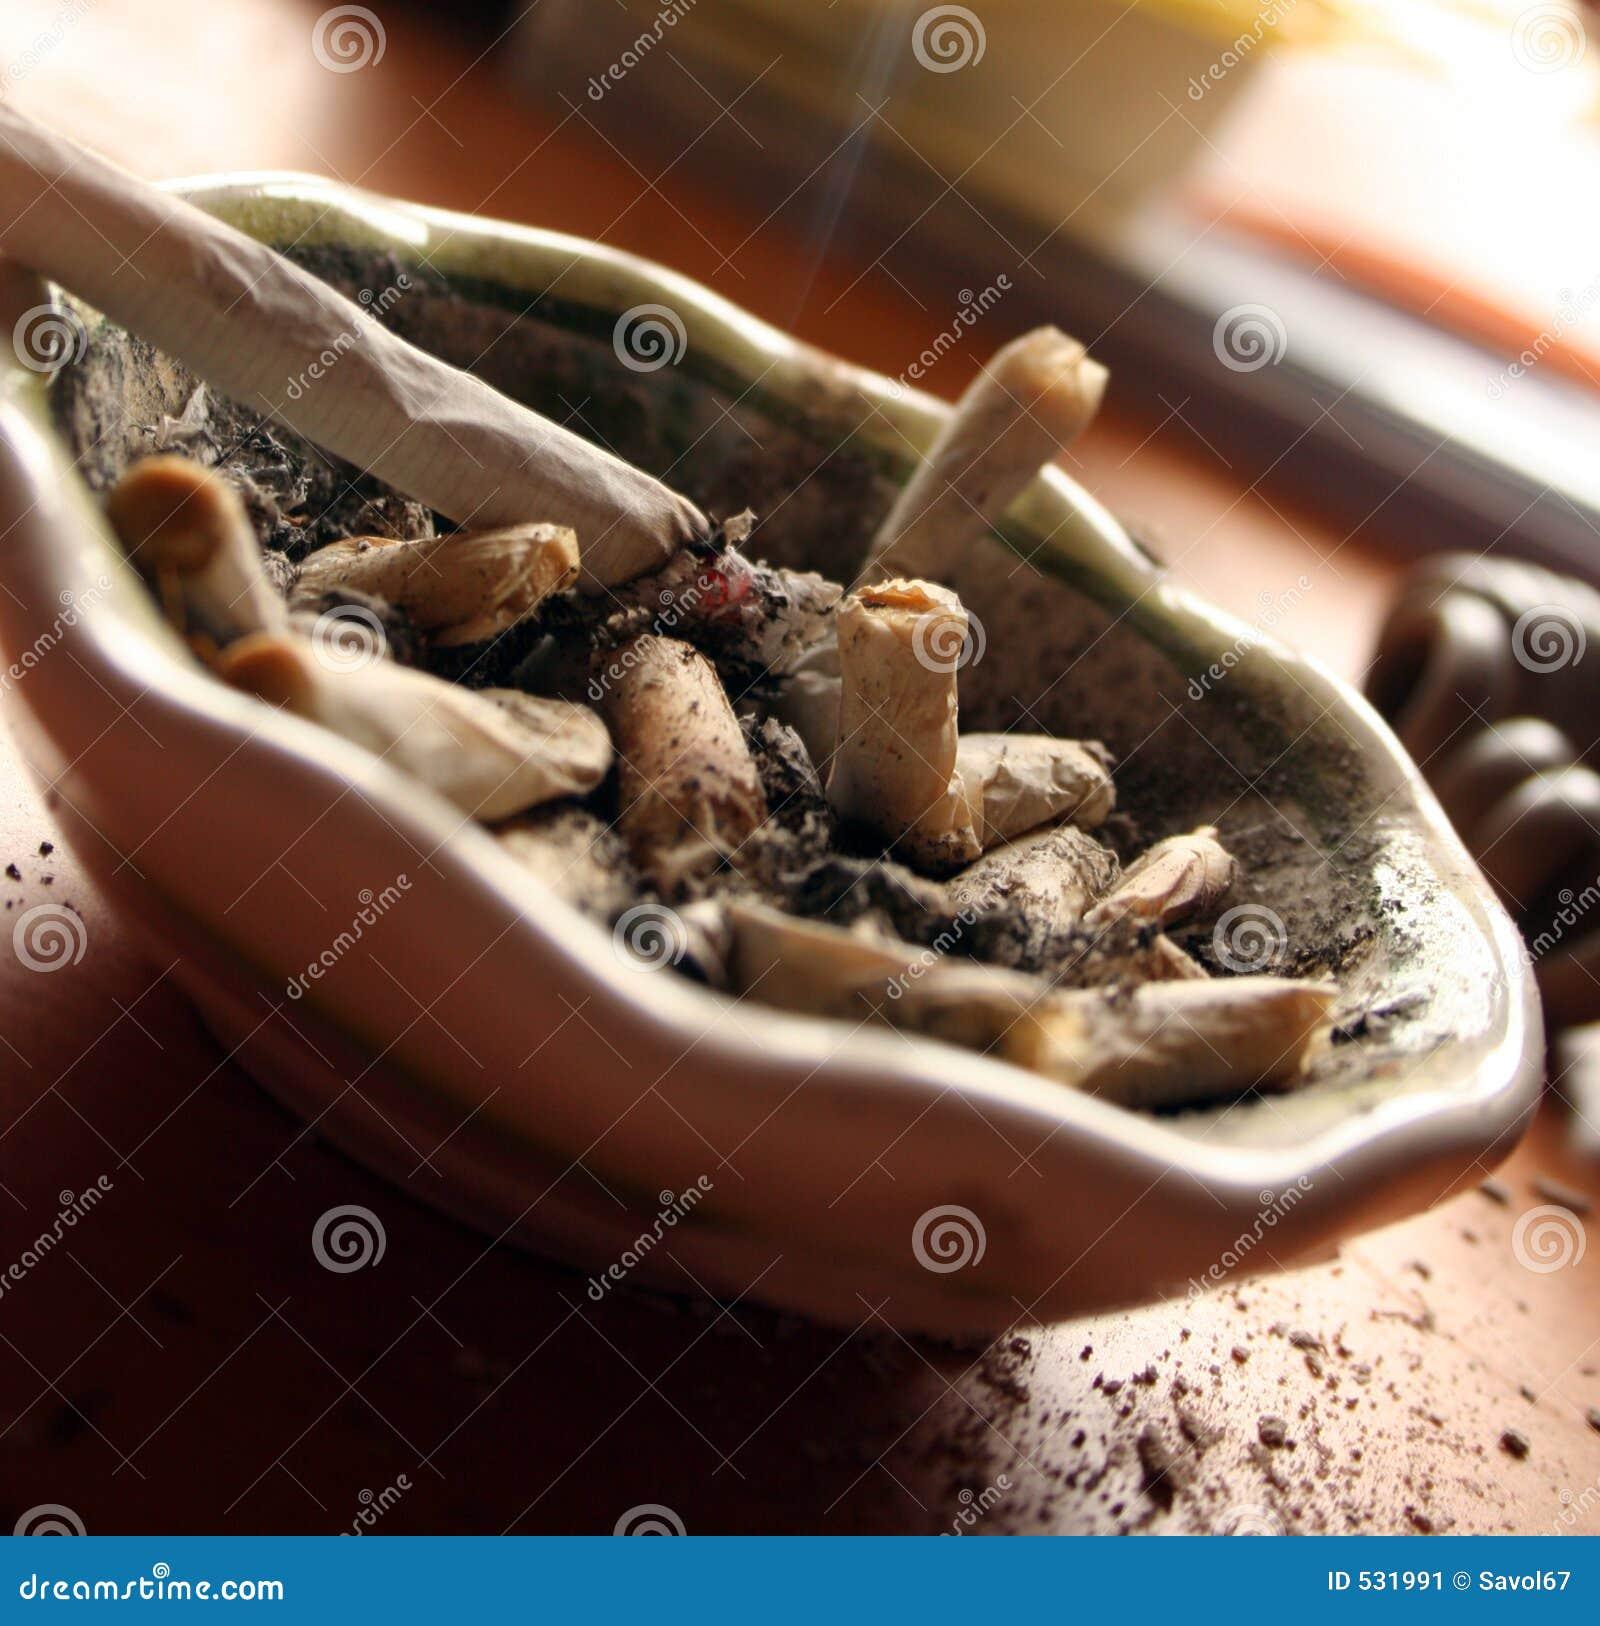 Download 离开的抽烟 库存图片. 图片 包括有 ashame, 离开, 健康, 憎恶, 抽烟, 杂乱, ashly, 风险 - 531991